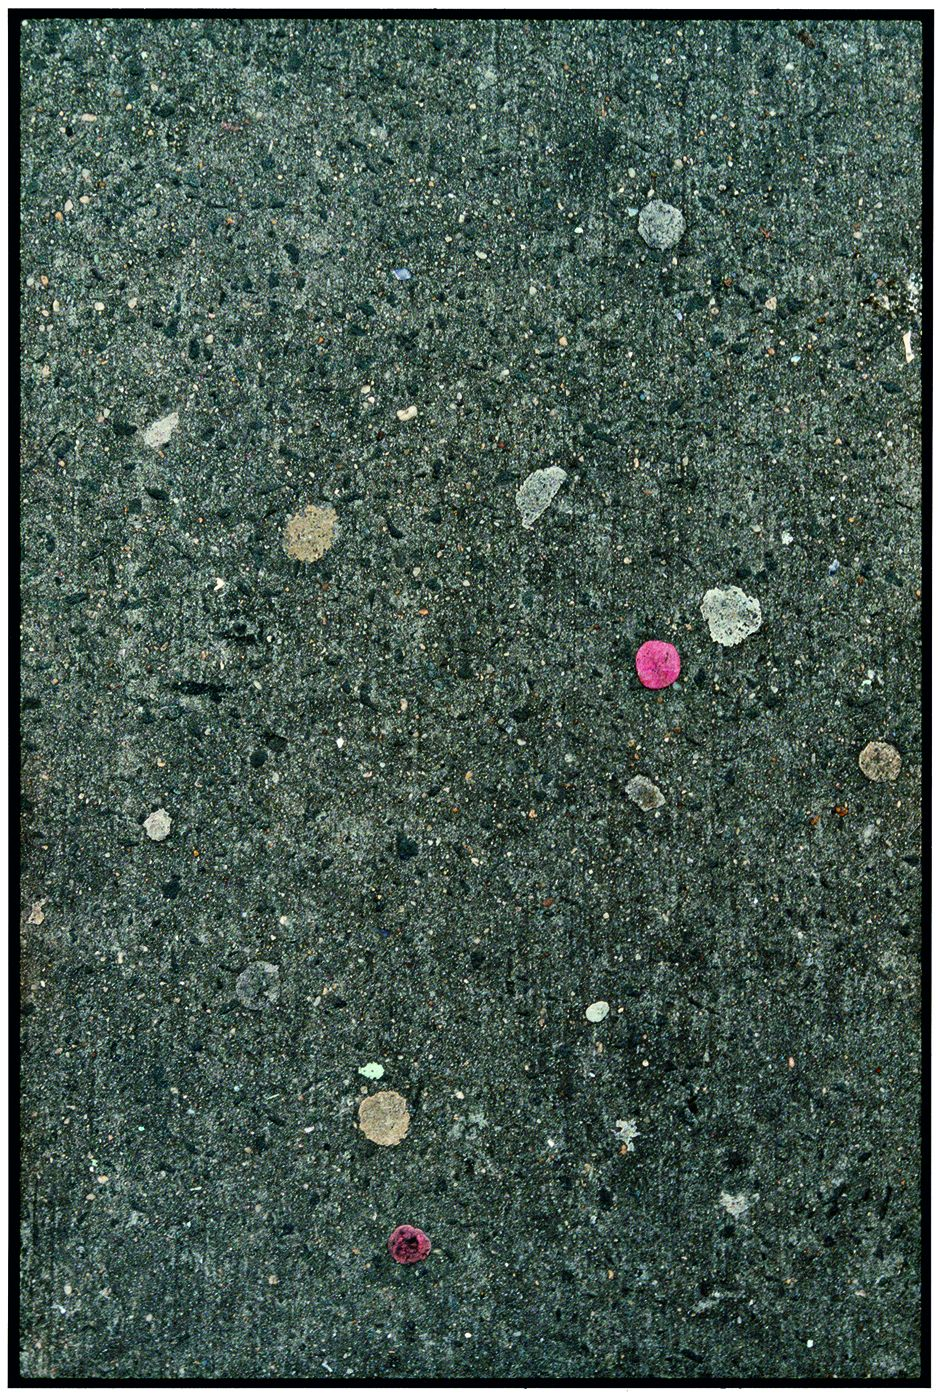 Zoe Leonard, Bubblegum No. 2, 2000